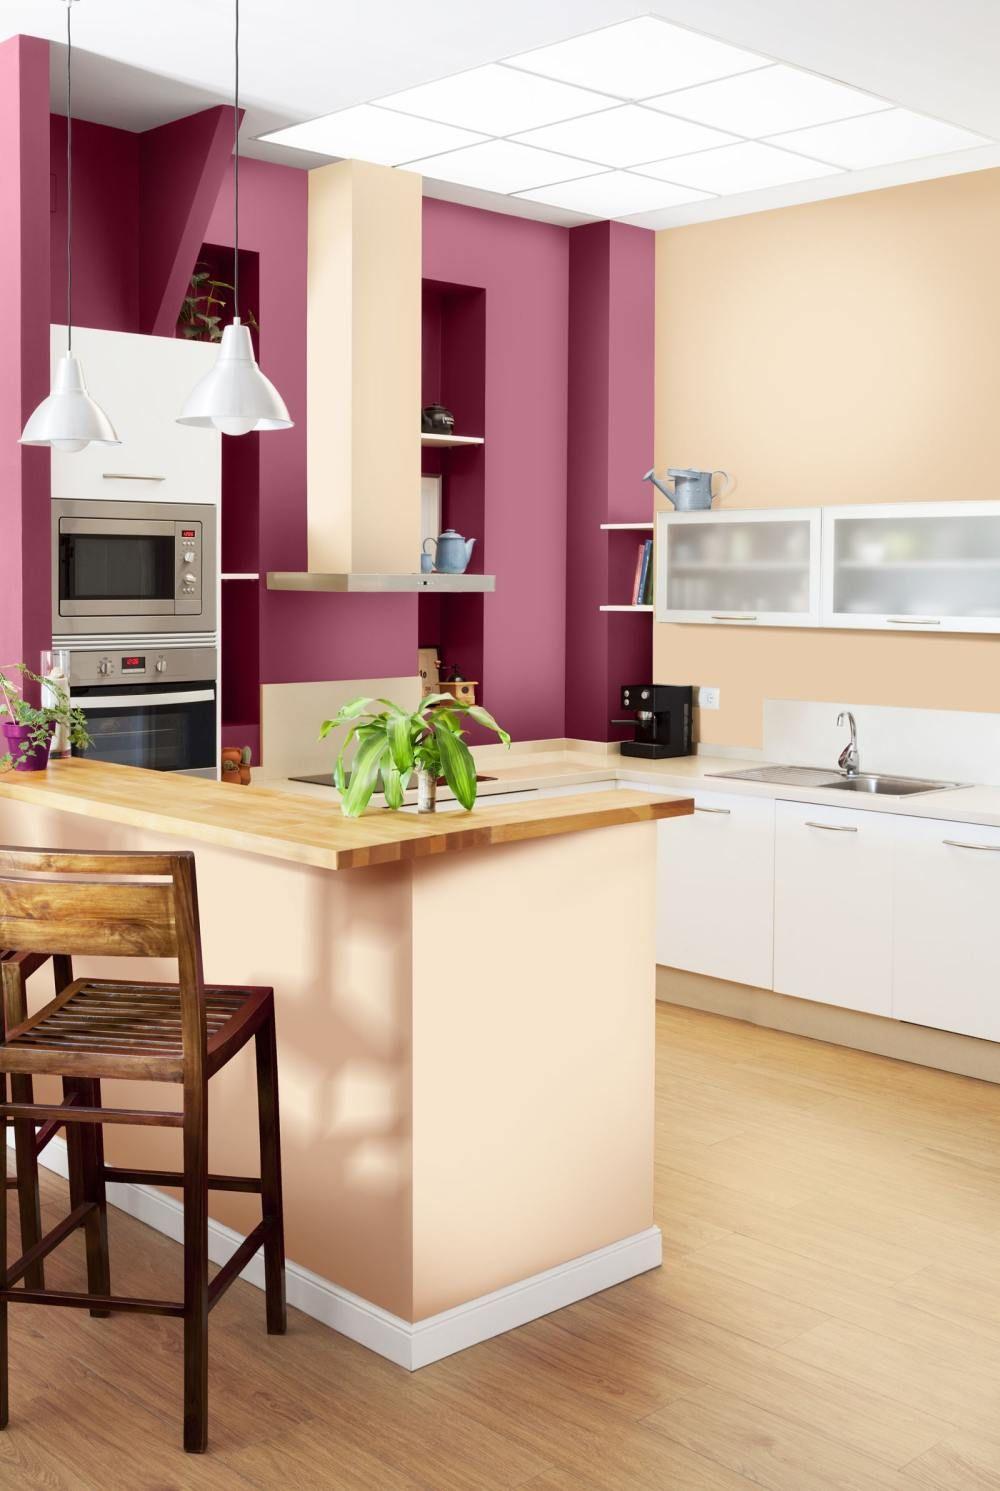 fioletowy kolor w kuchni fioletowy kolor w kuchni   kuchnie   inspiracje   pinterest  rh   pinterest com